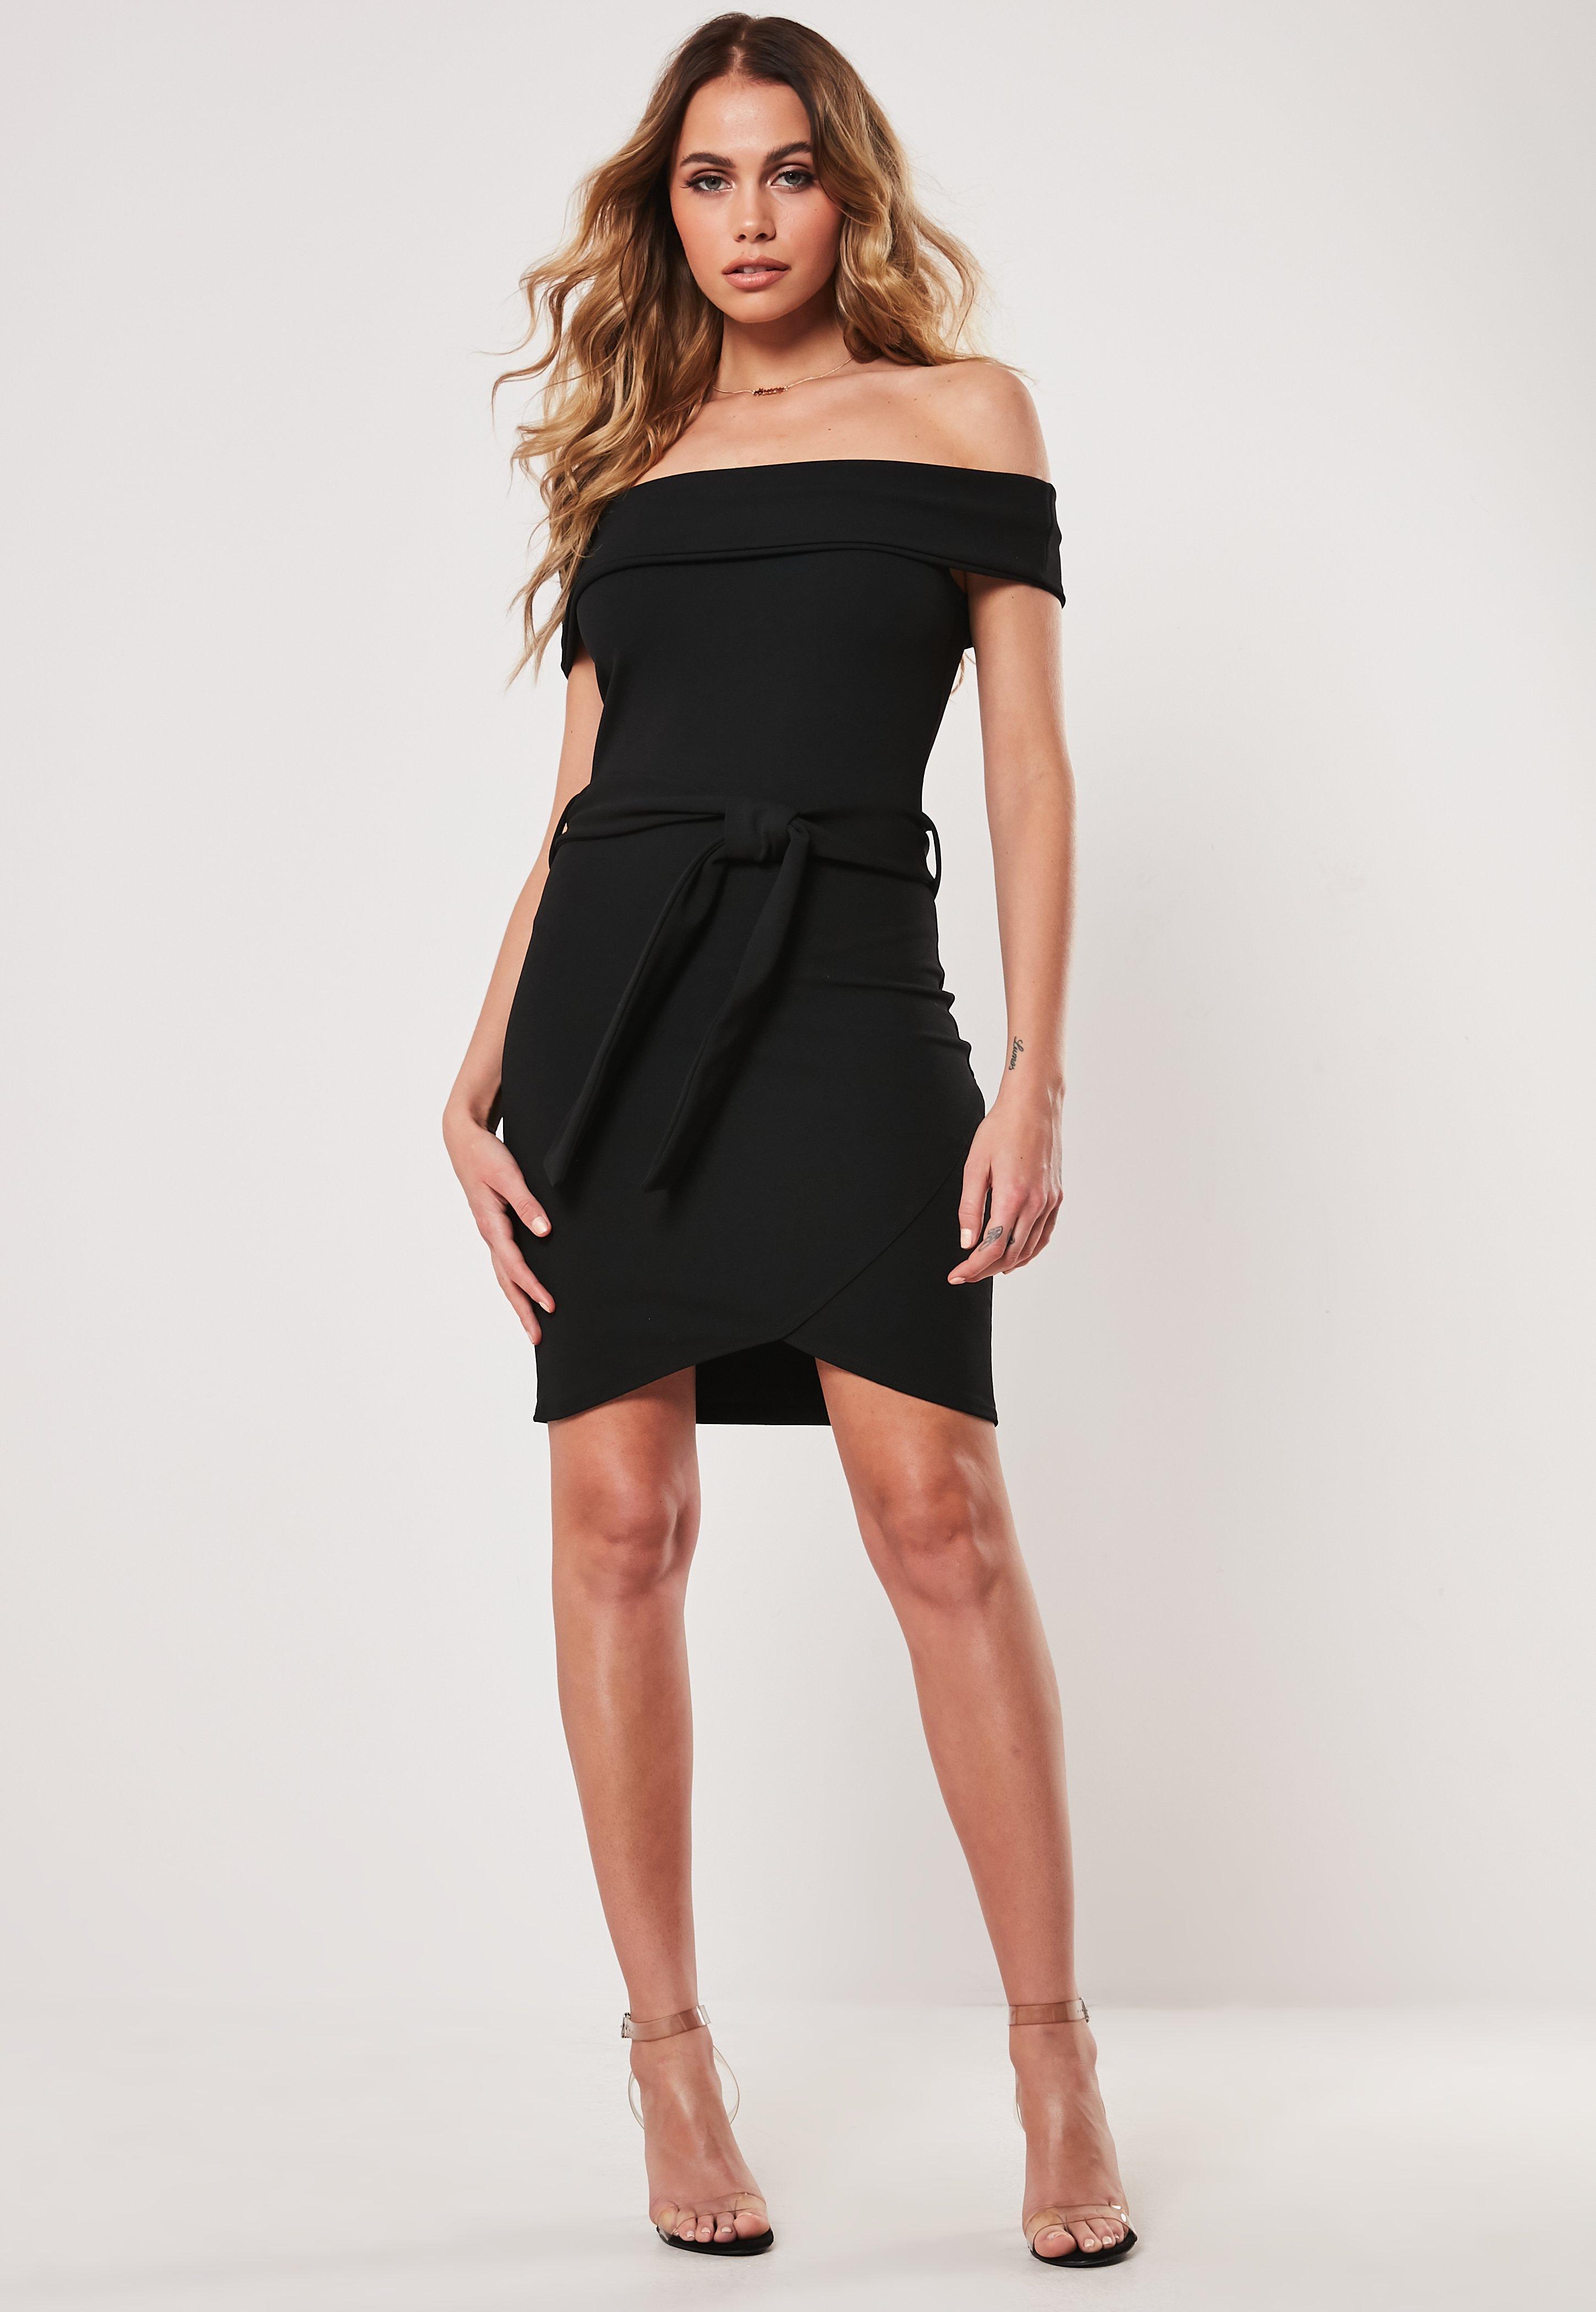 0161348b19d36 Bardot Dresses | Off the Shoulder Dresses - Missguided